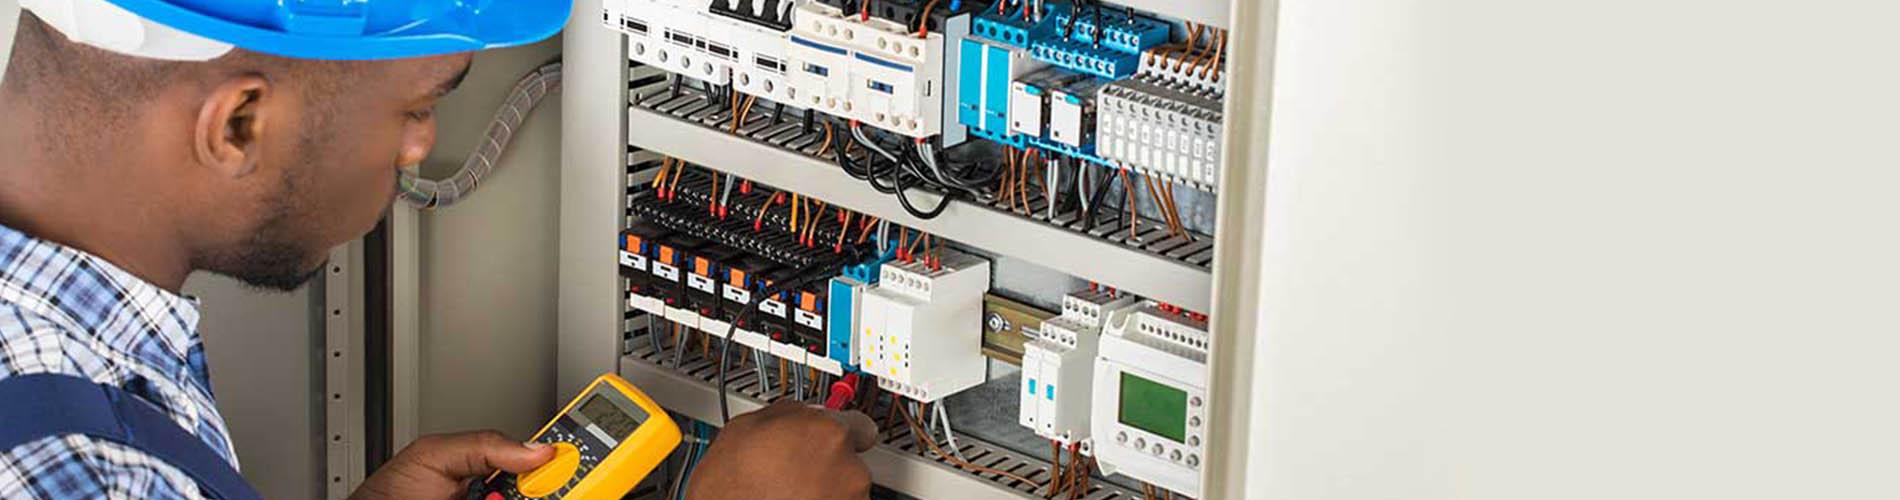 Electrical Apprecnticeship Program